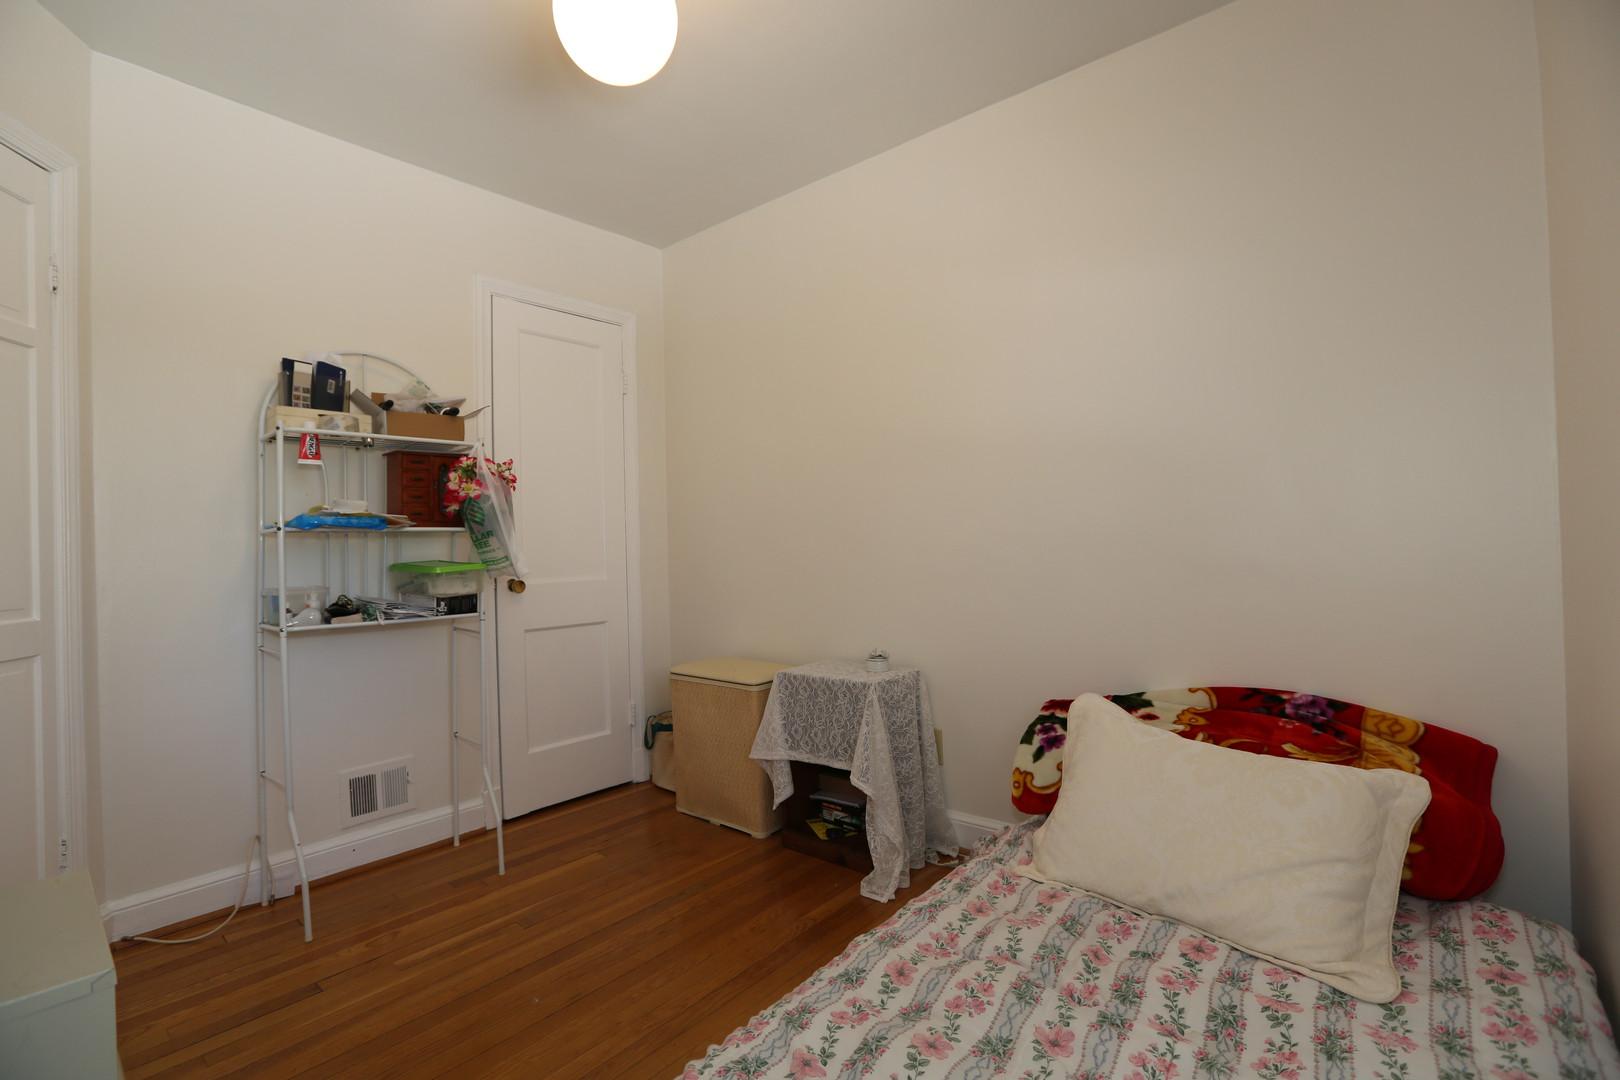 20-1 Bedroom.jpg